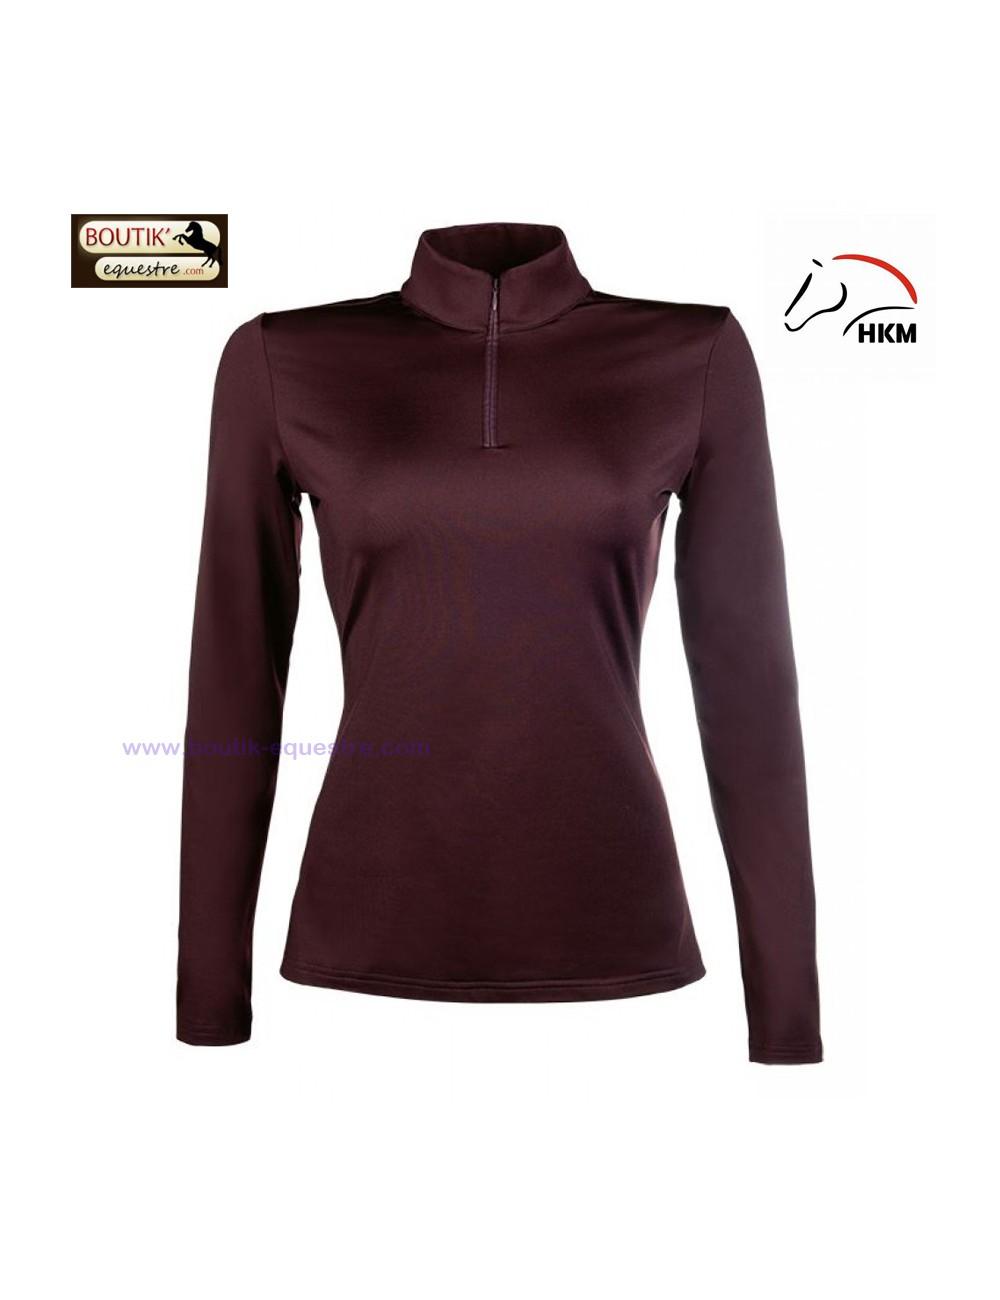 Shirt HKM Fonctionnel Basic ML